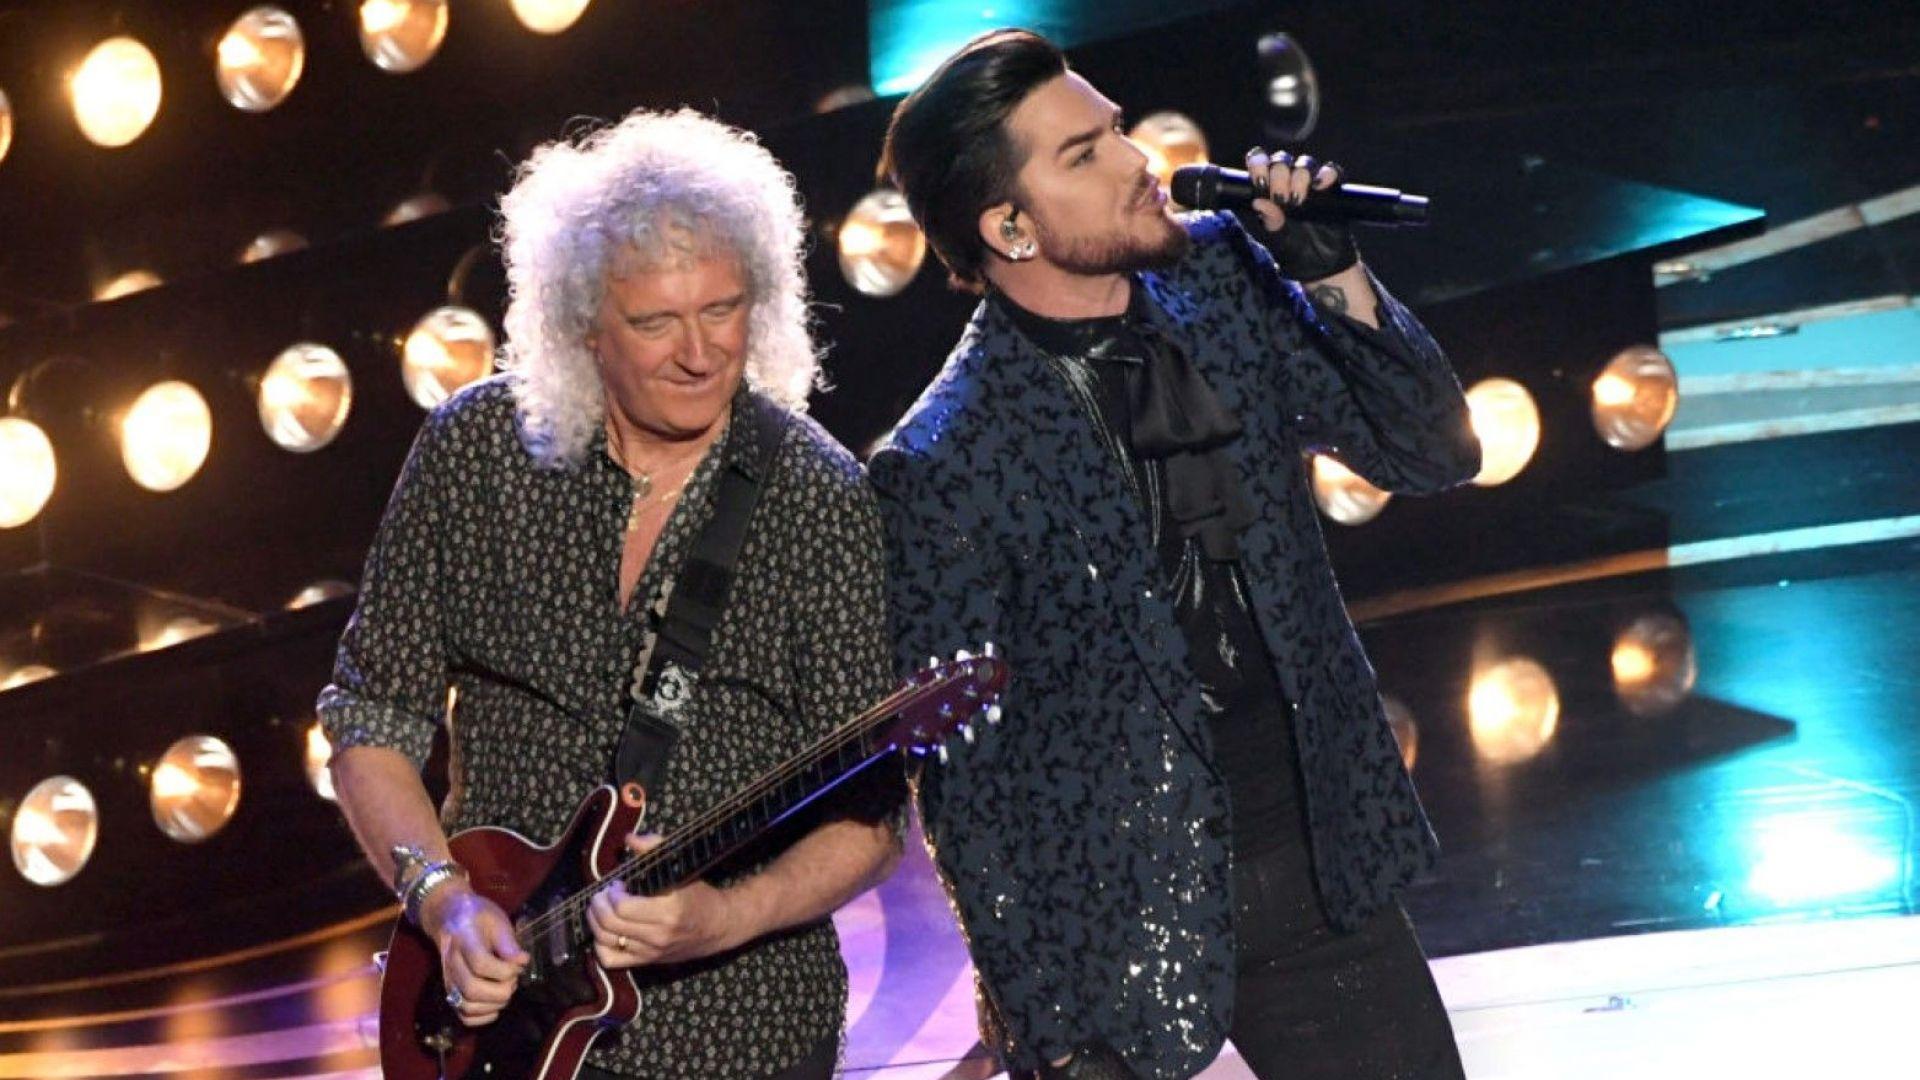 Queen и Адам Ламбърт тръгват на турне